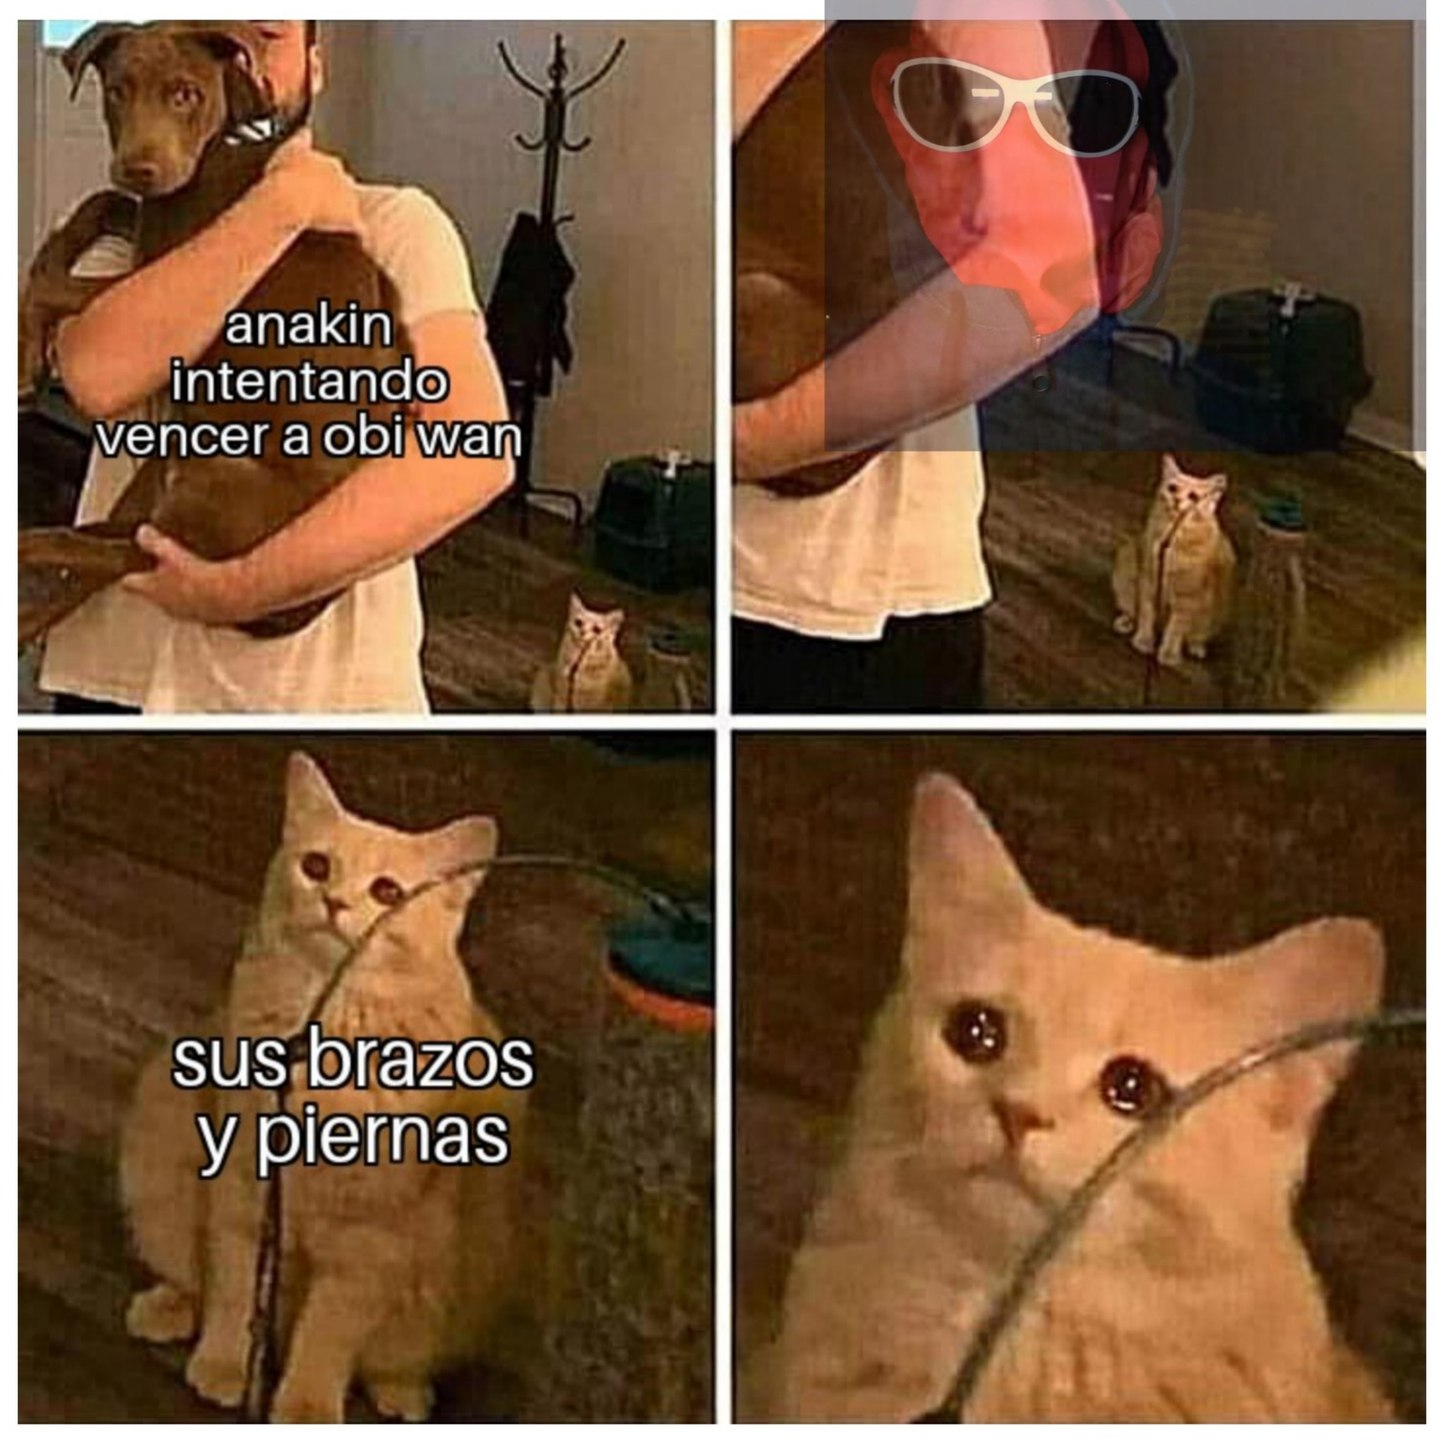 Anakin la cagaste - meme